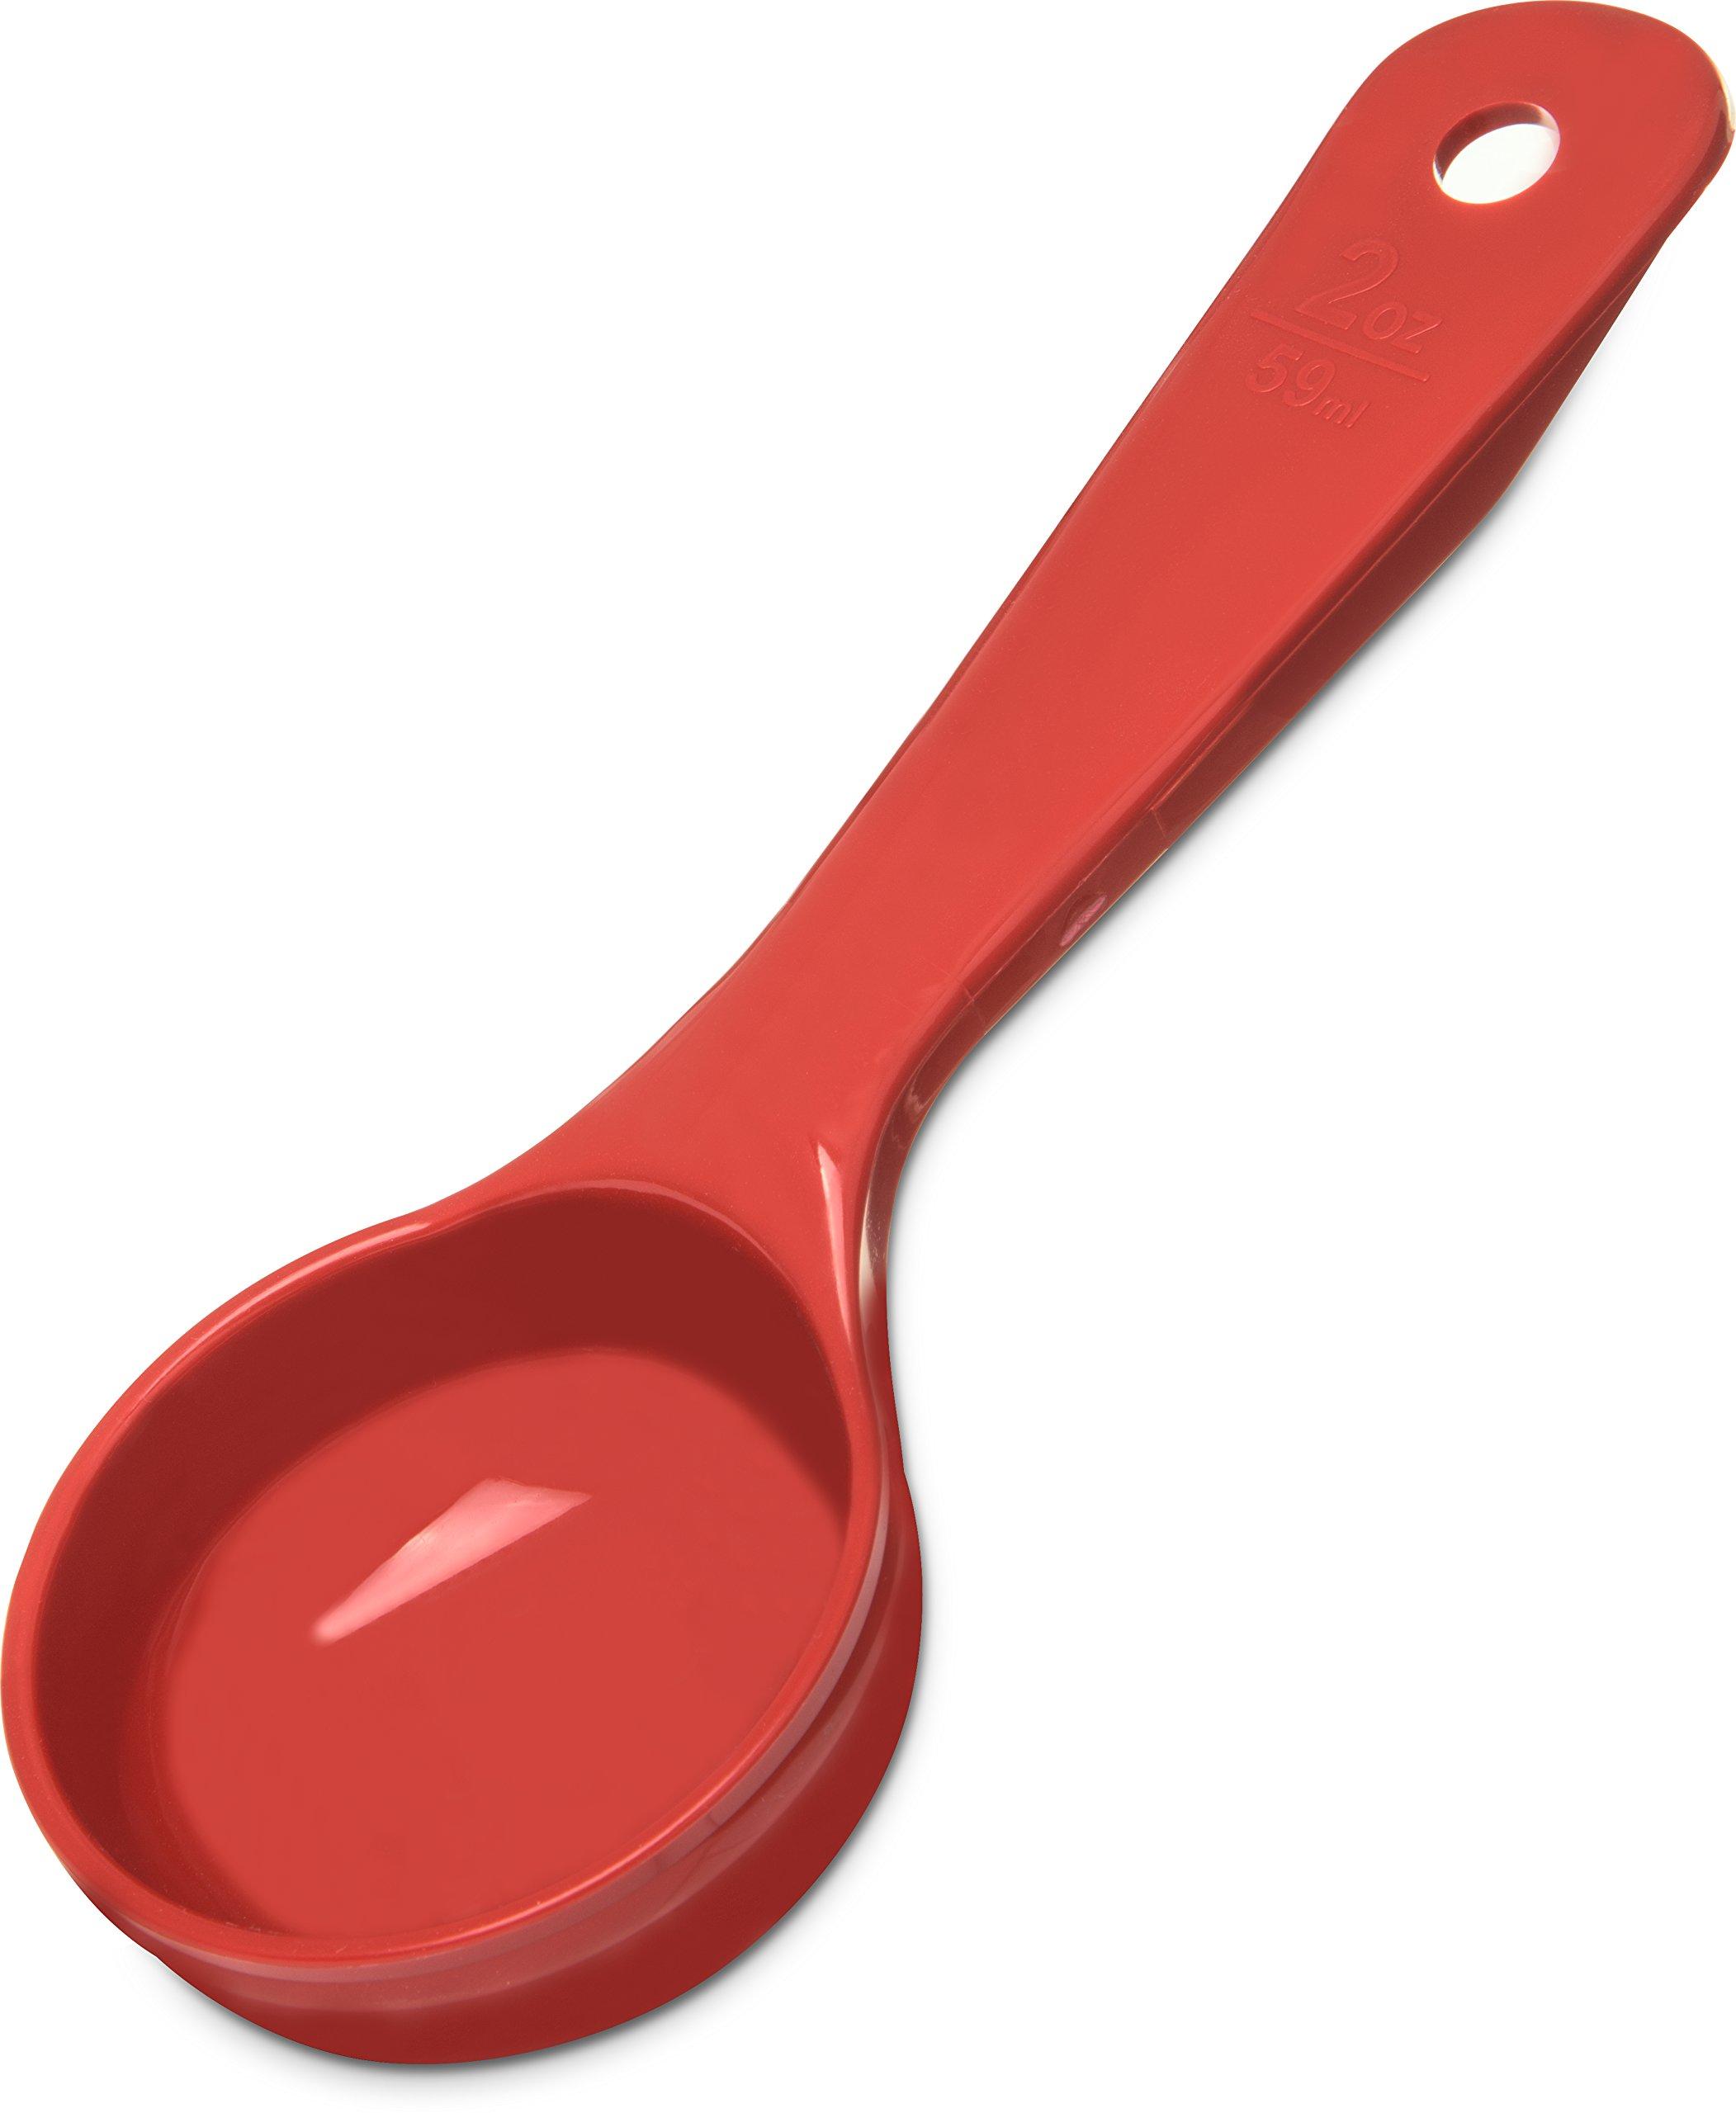 Carlisle 492405 Solid Short Handle Portion Control Spoon, 2 oz, Red